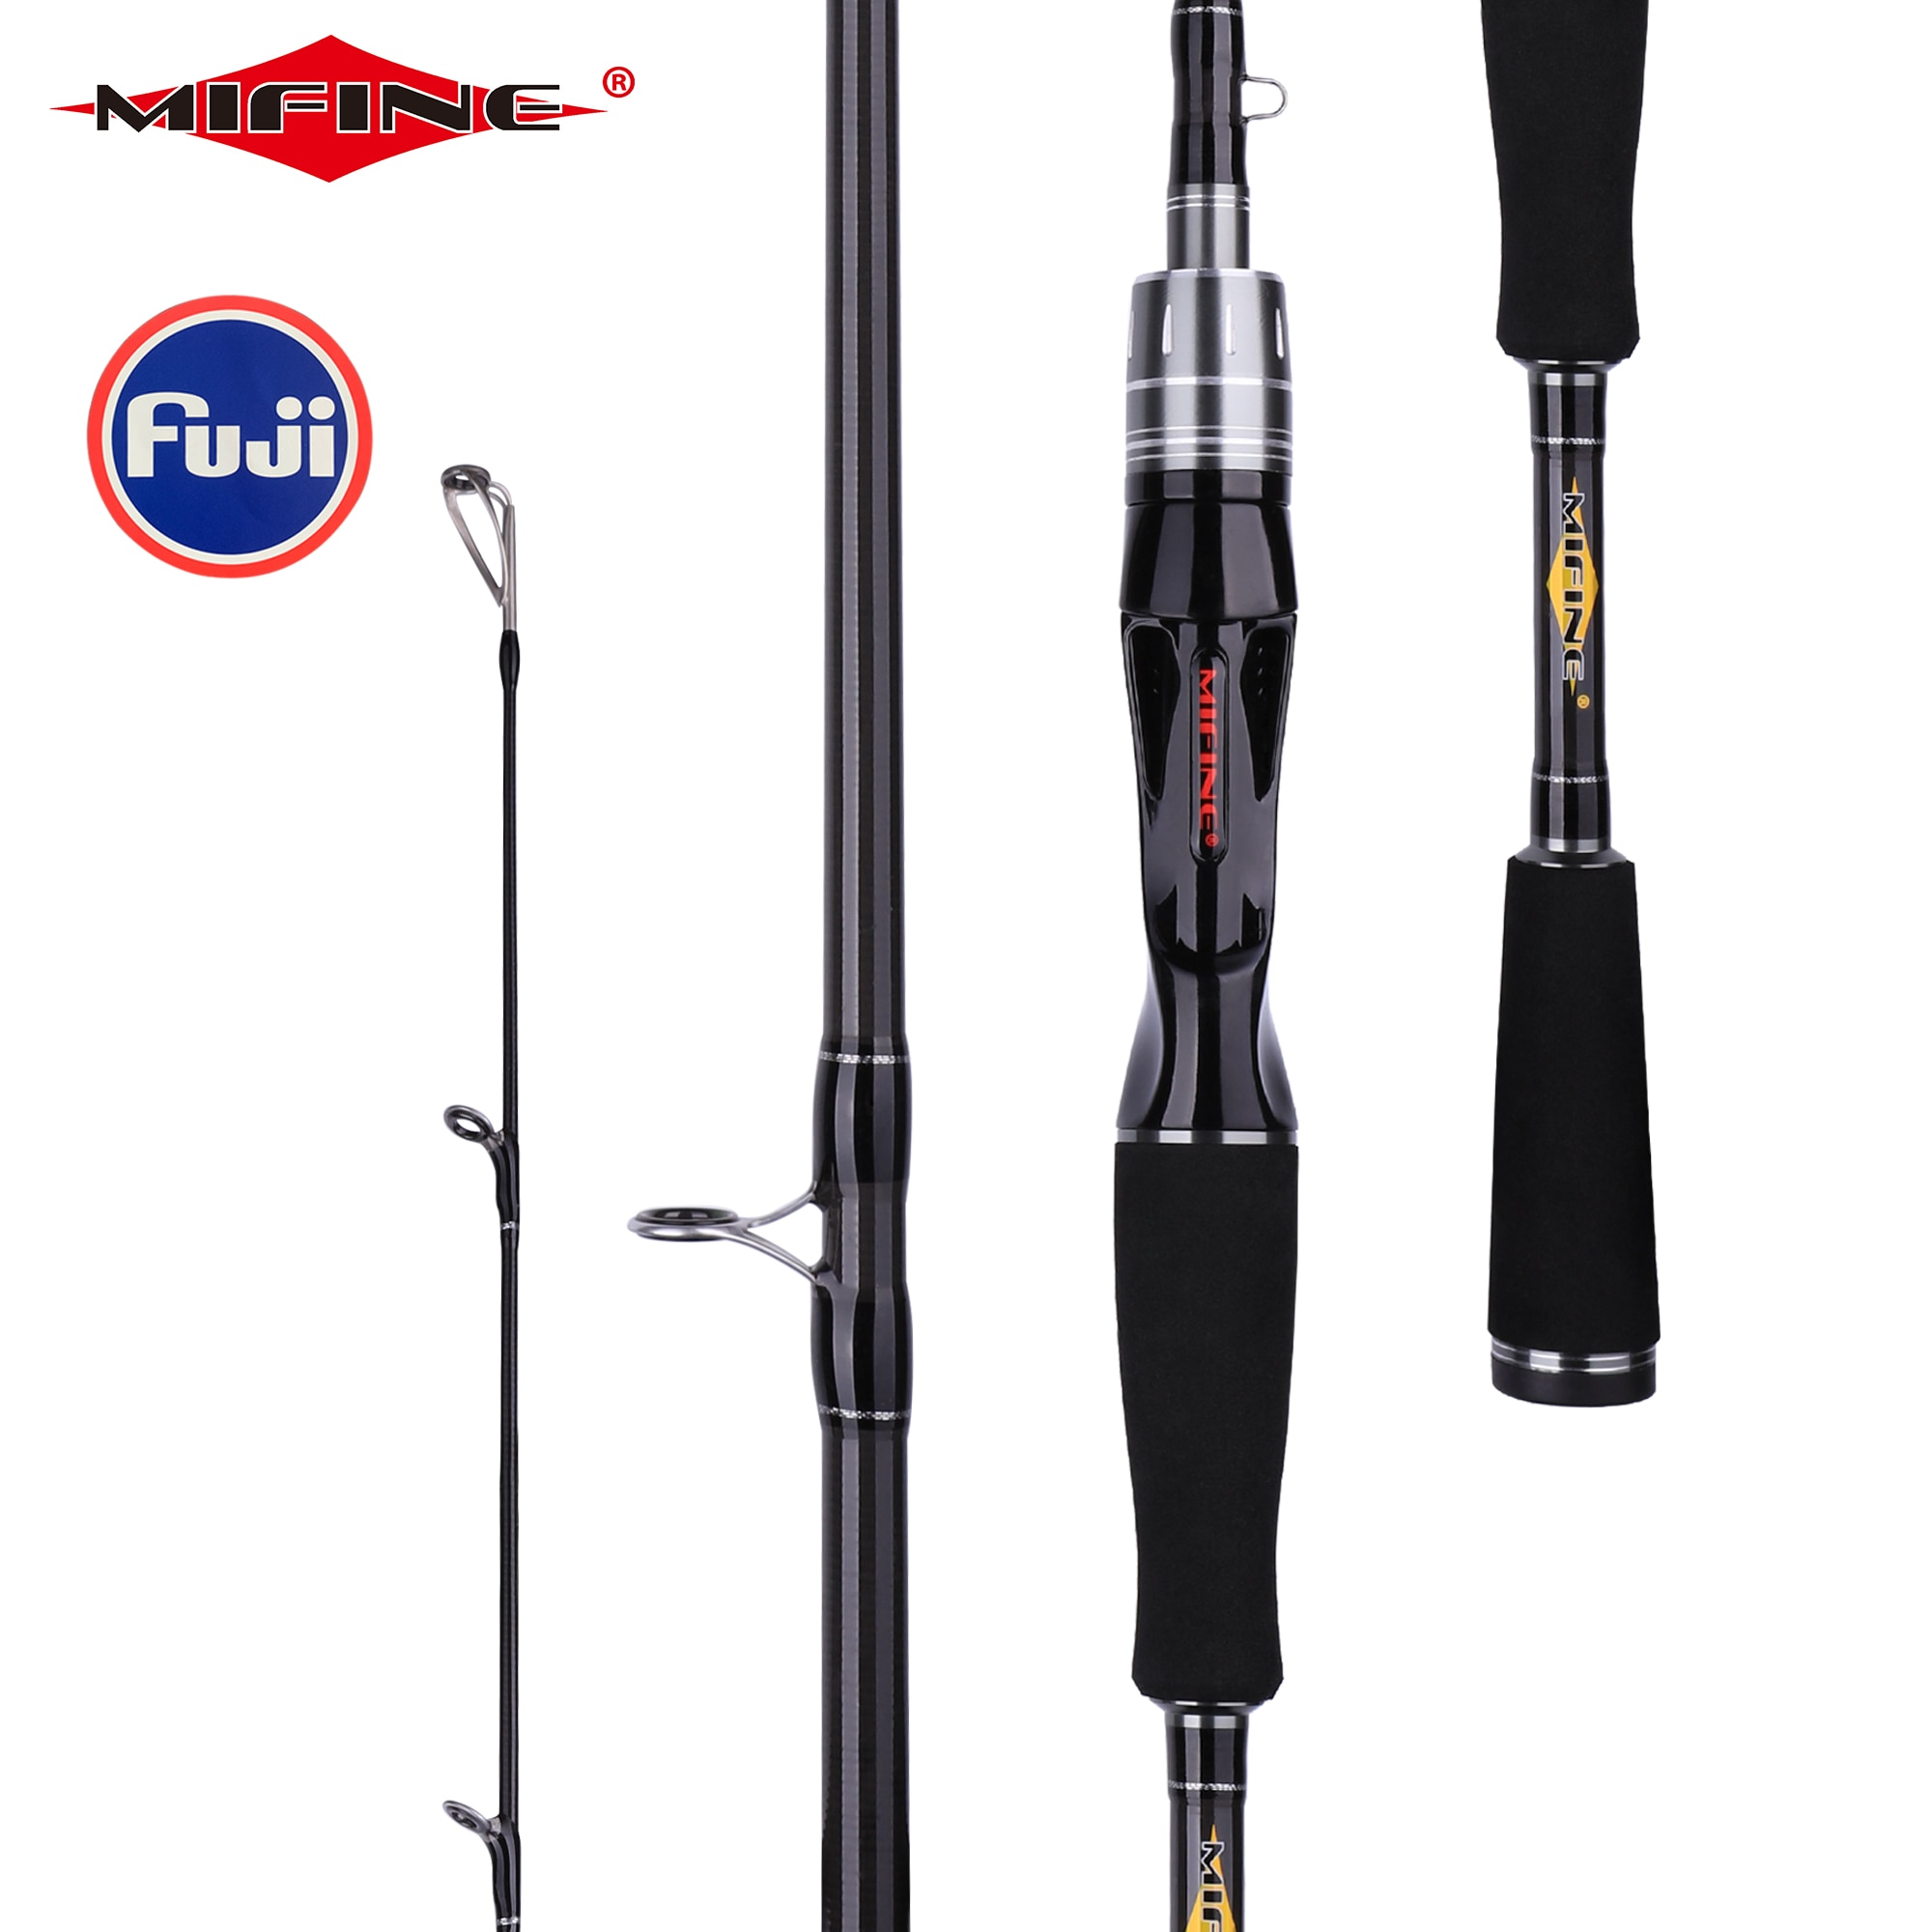 AliExpress - MIFINE Baitcasting Lure Fishing Rod 1.68m 1.8m 2.1m 2.4m 2.7m 3.0m Carbon Casting FUJI Guide travel lure Rod 3-50g ML/M/MH